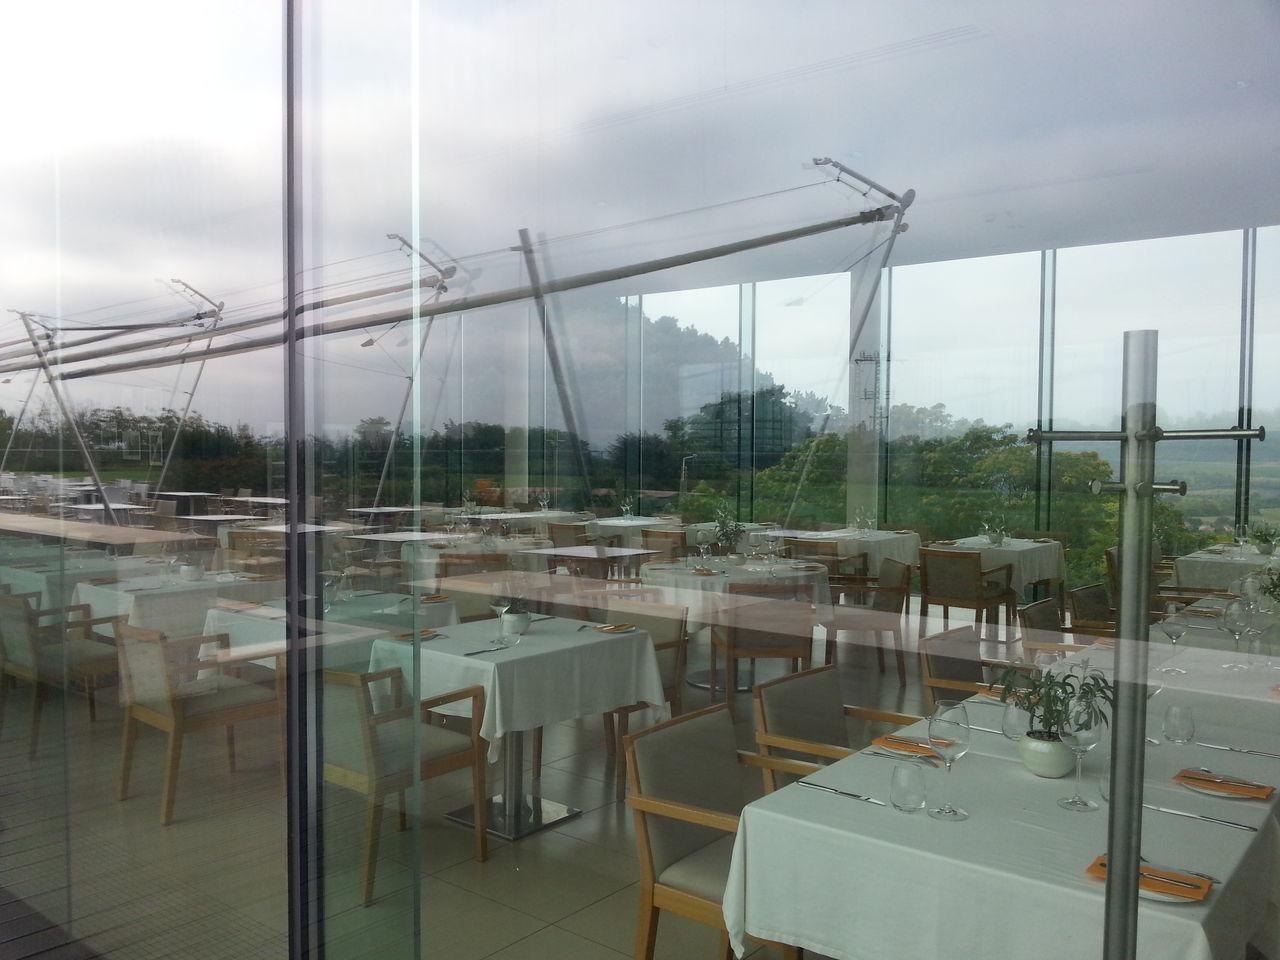 Modern Architecture Restaurant Pannonhalma Hungary Glasses Reflect View Thearchitect-2016-eyeemawards Fine Art Photography